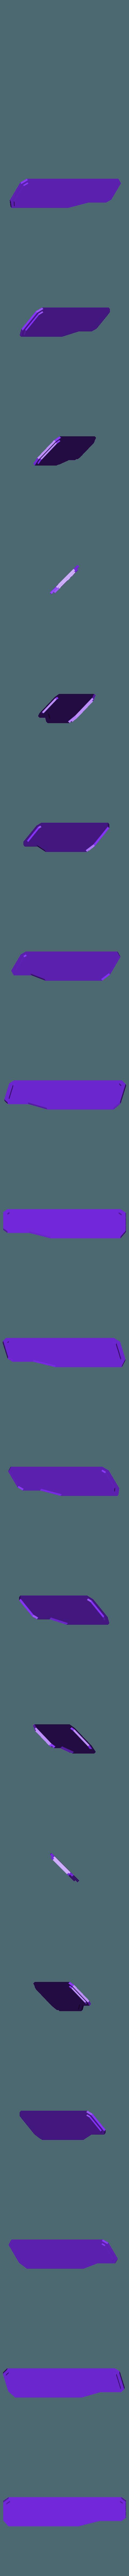 Pi_Omen_glass.stl Download free STL file Raspberry Pi 3 OMEN Accelerator Case • 3D printable object, Chaco